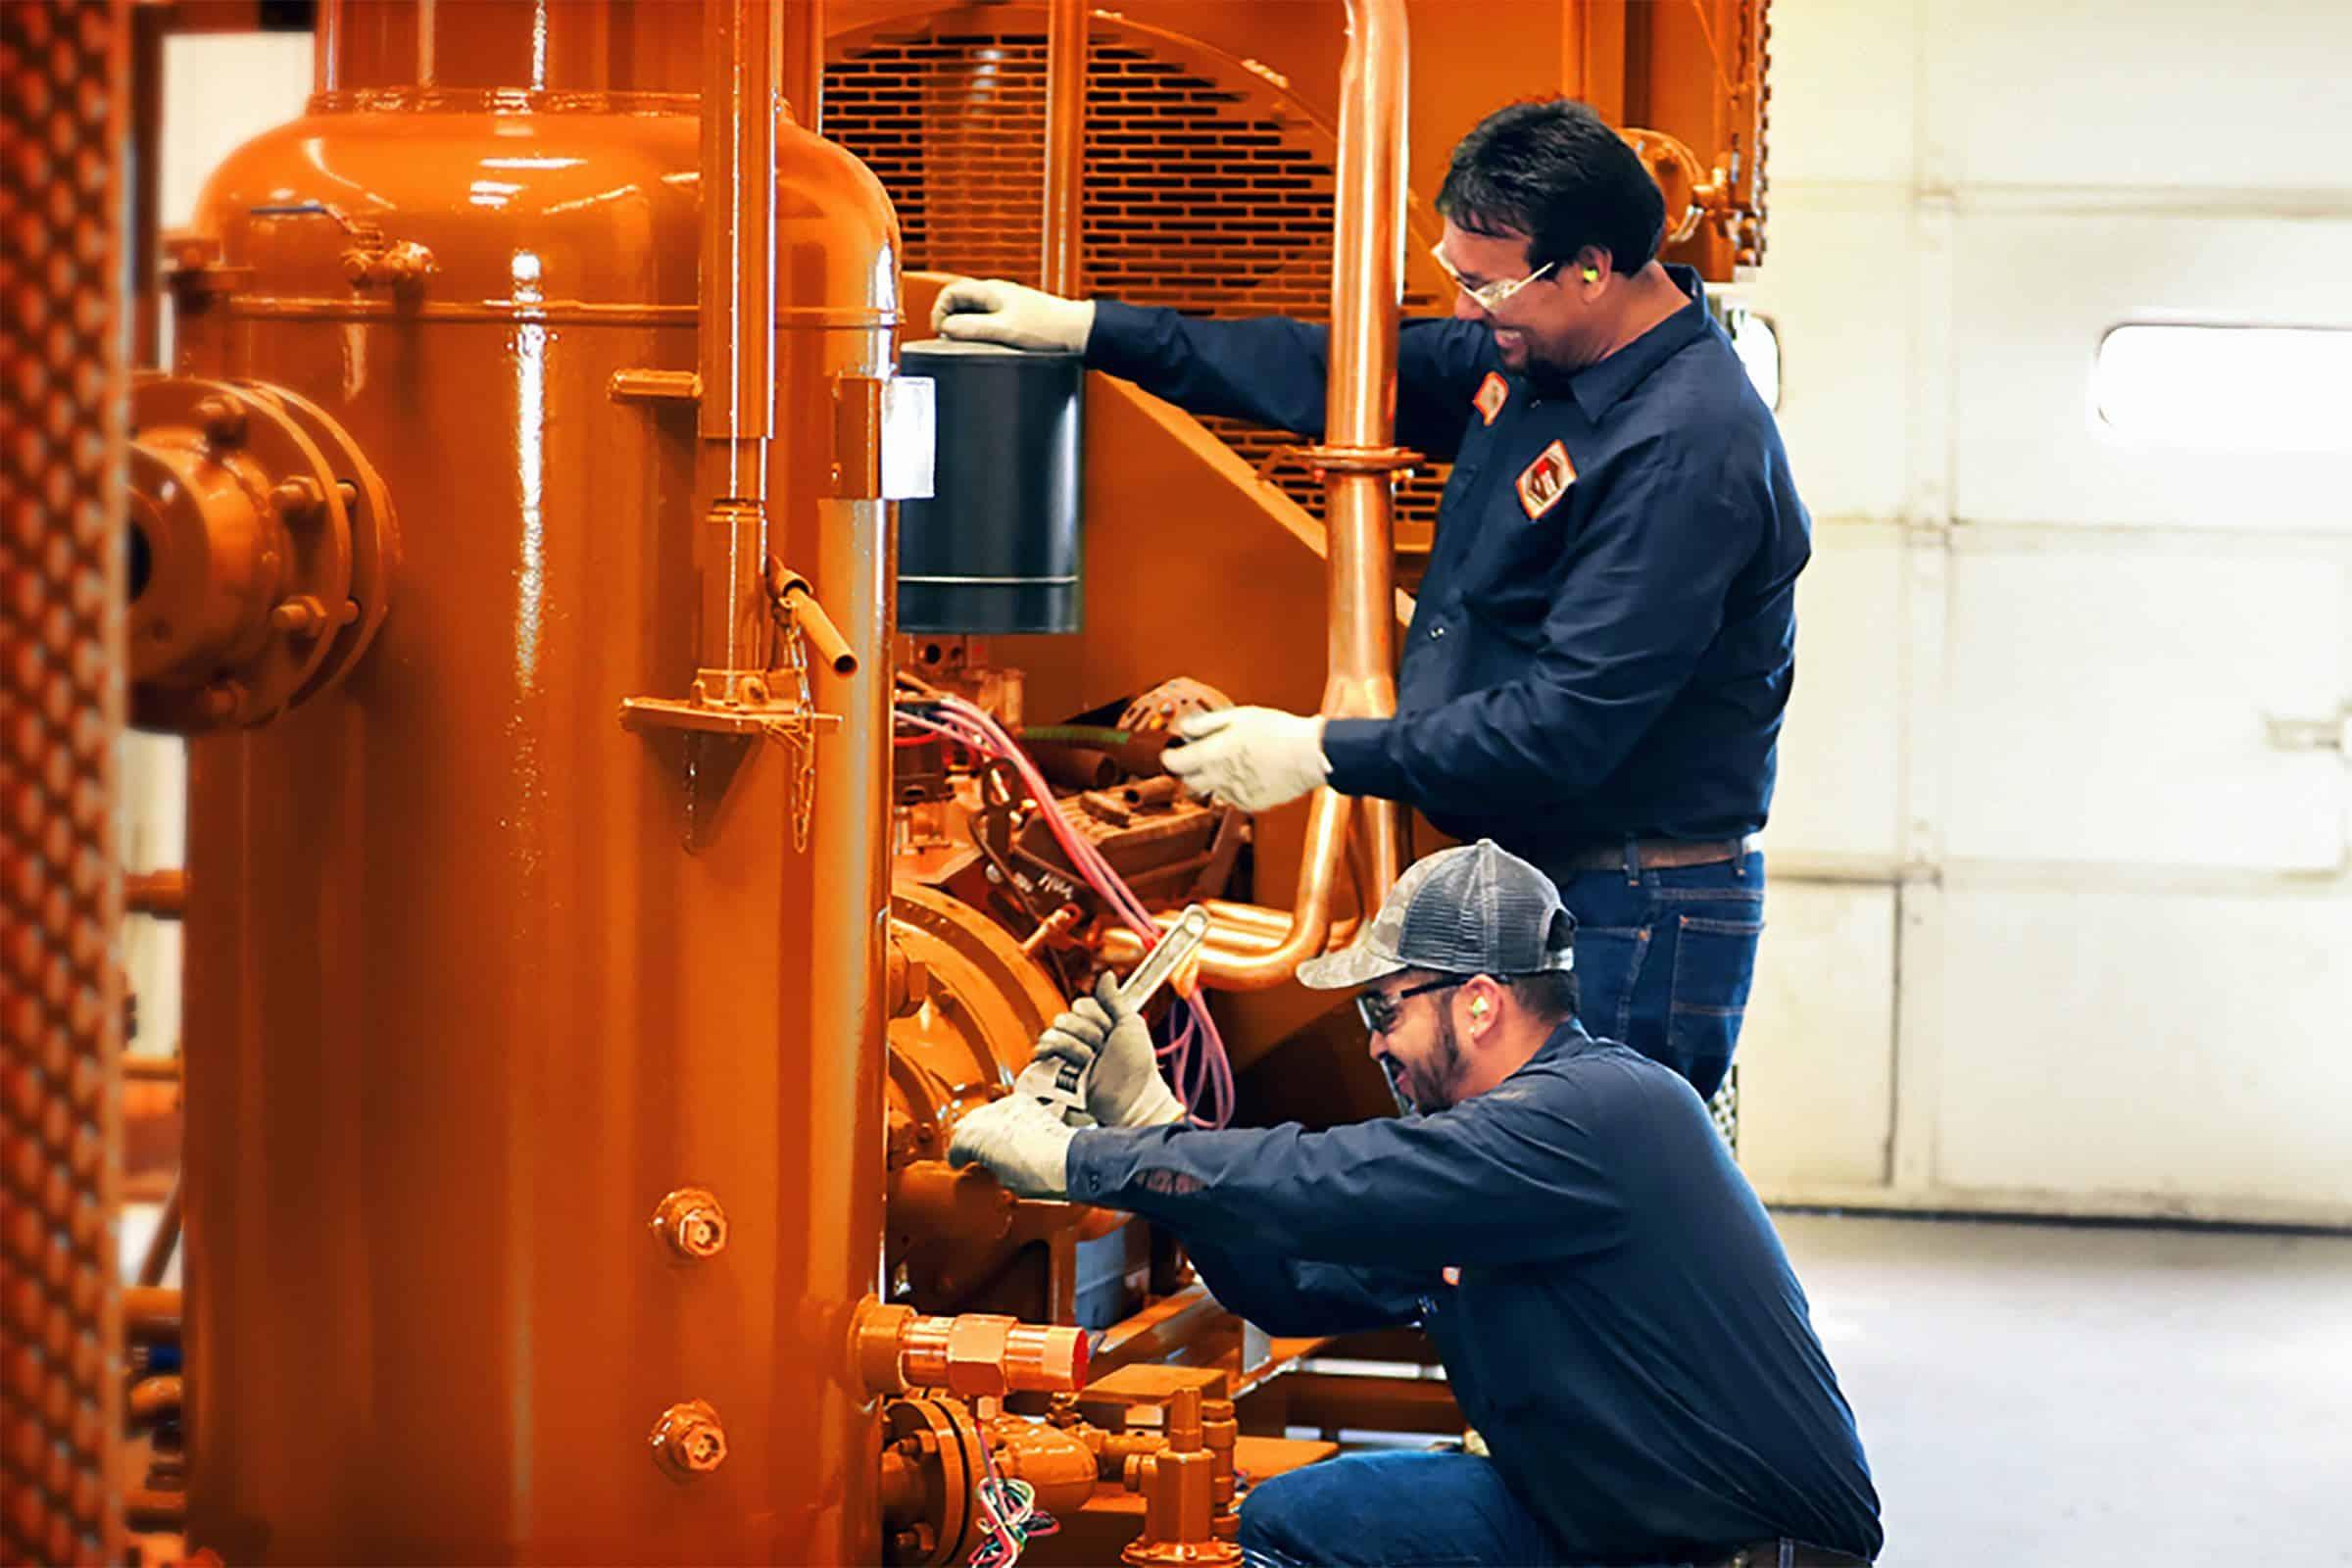 2 men in PPE working on equipment